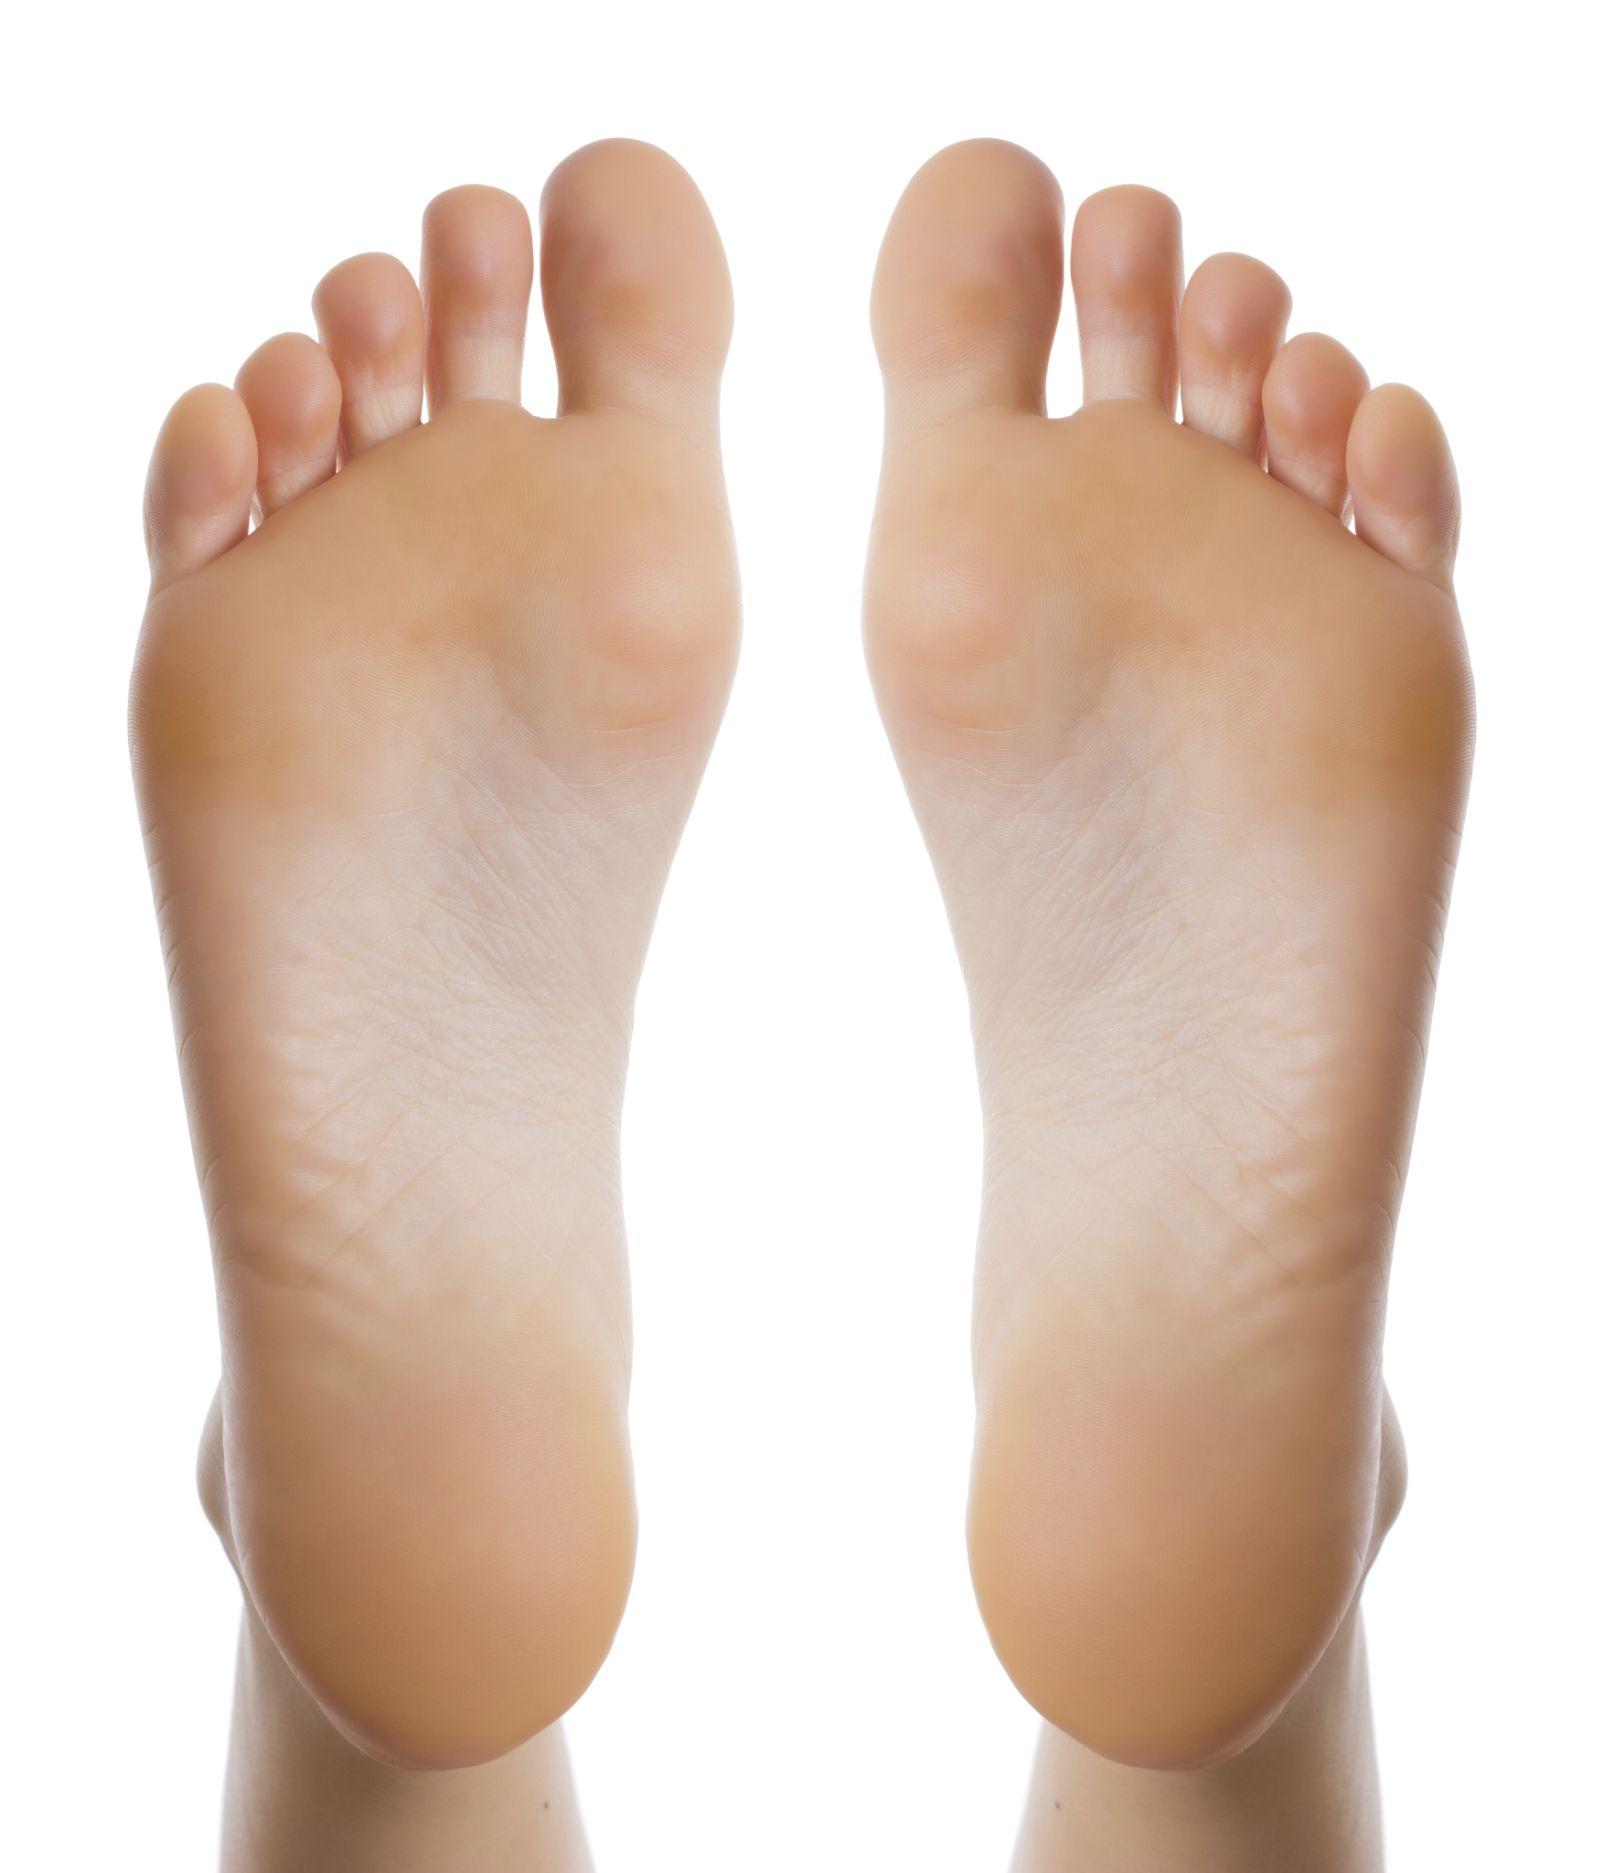 bottom of the feet - Google Search | Pose | Pinterest | Anatomy